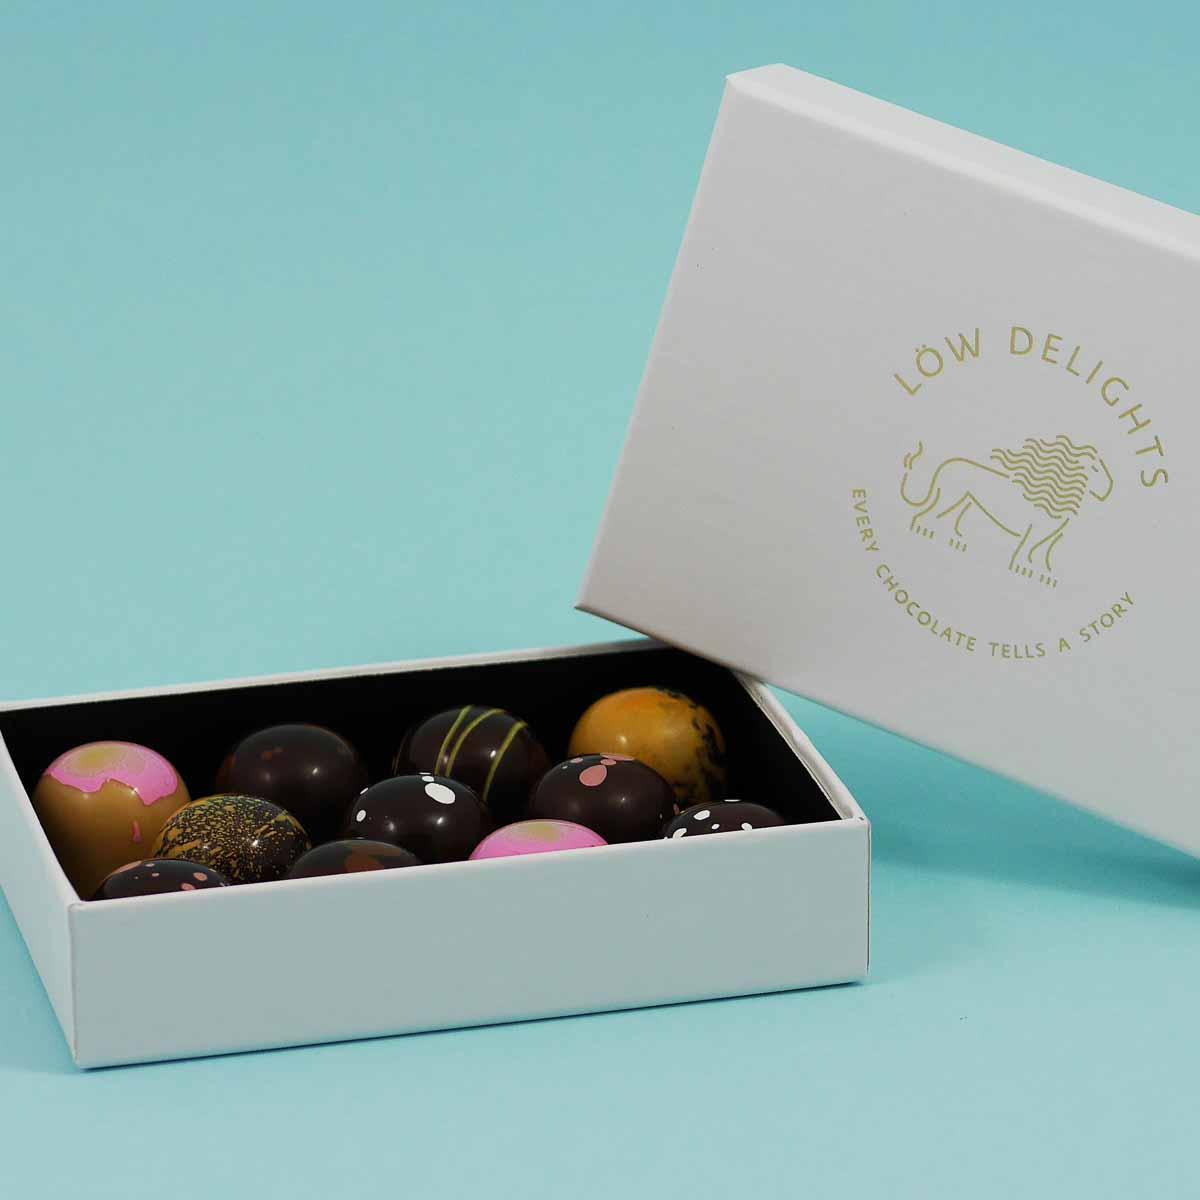 Löw Delights Gourmet Schokolade aus Zürich-10